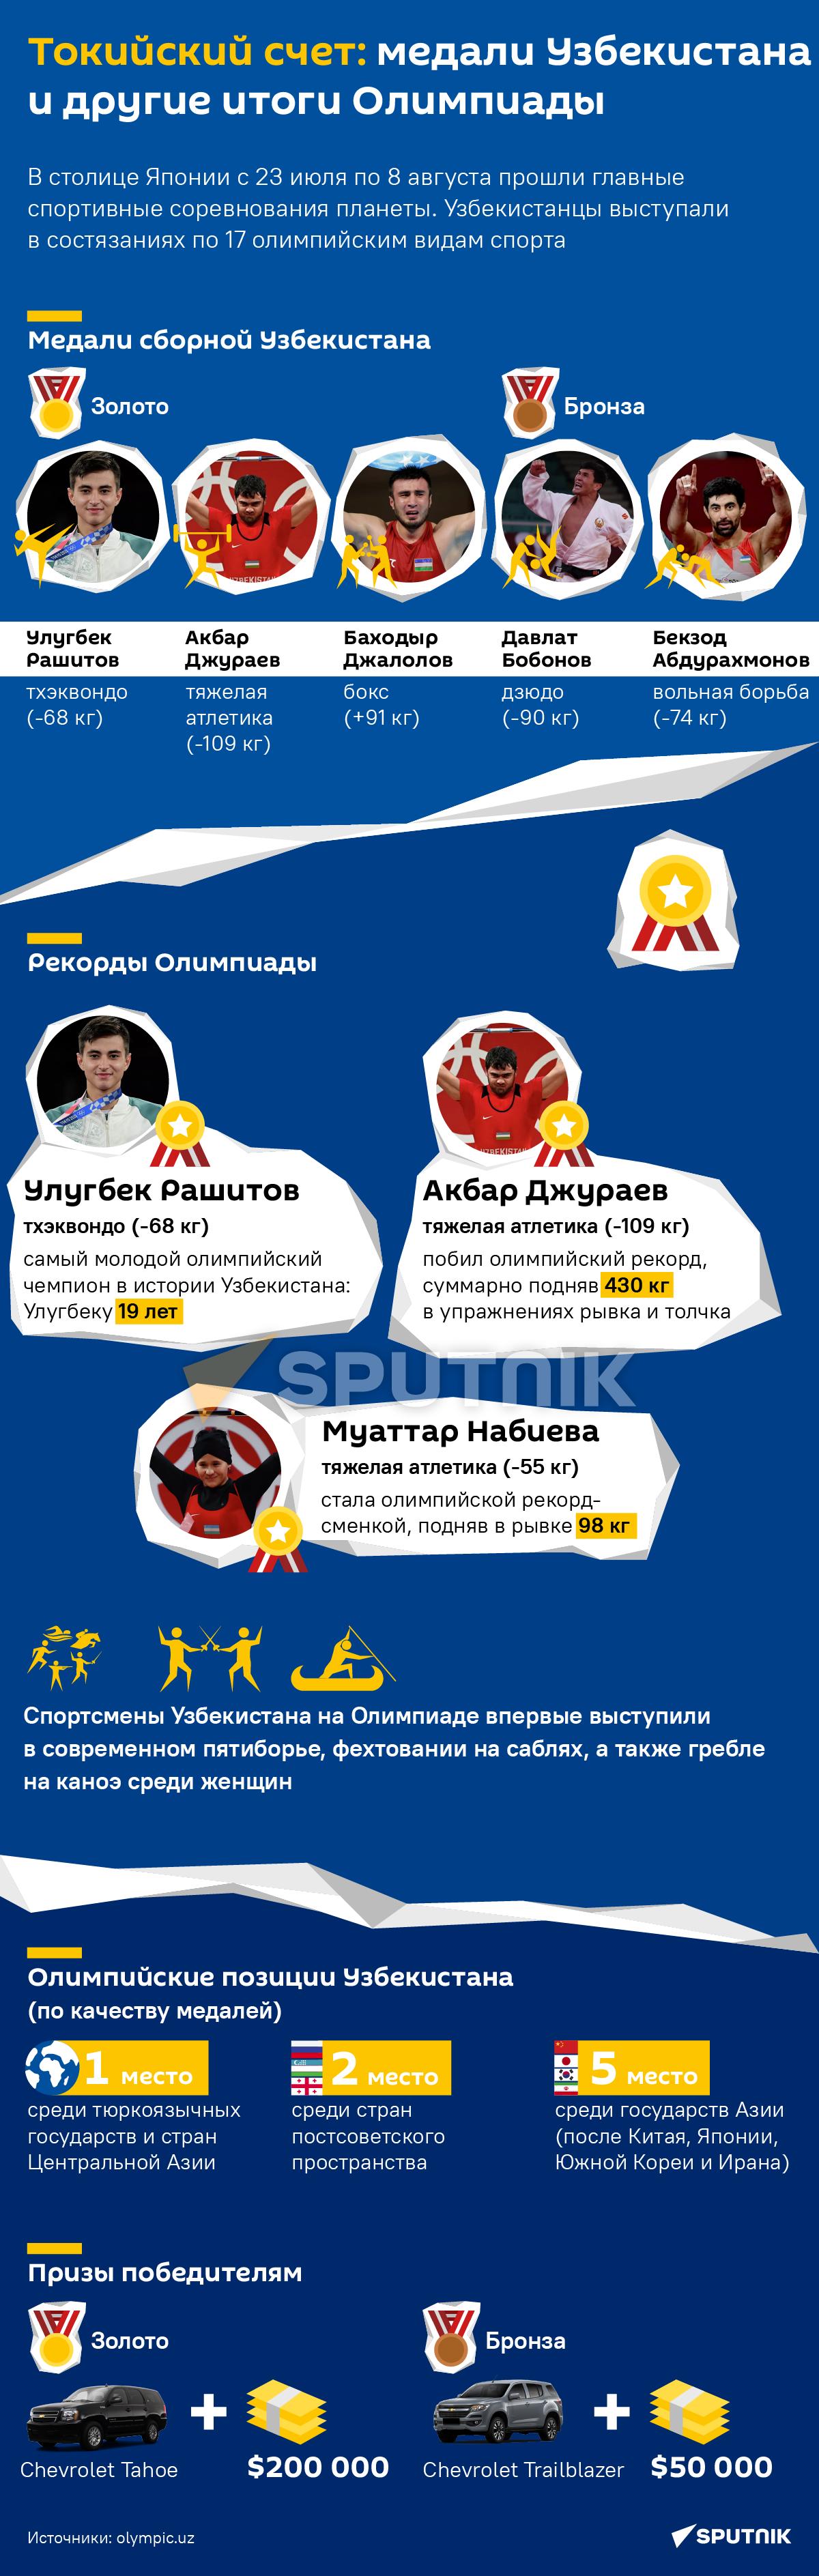 Узбекистан на Олимпиаде 2020 - Sputnik Узбекистан